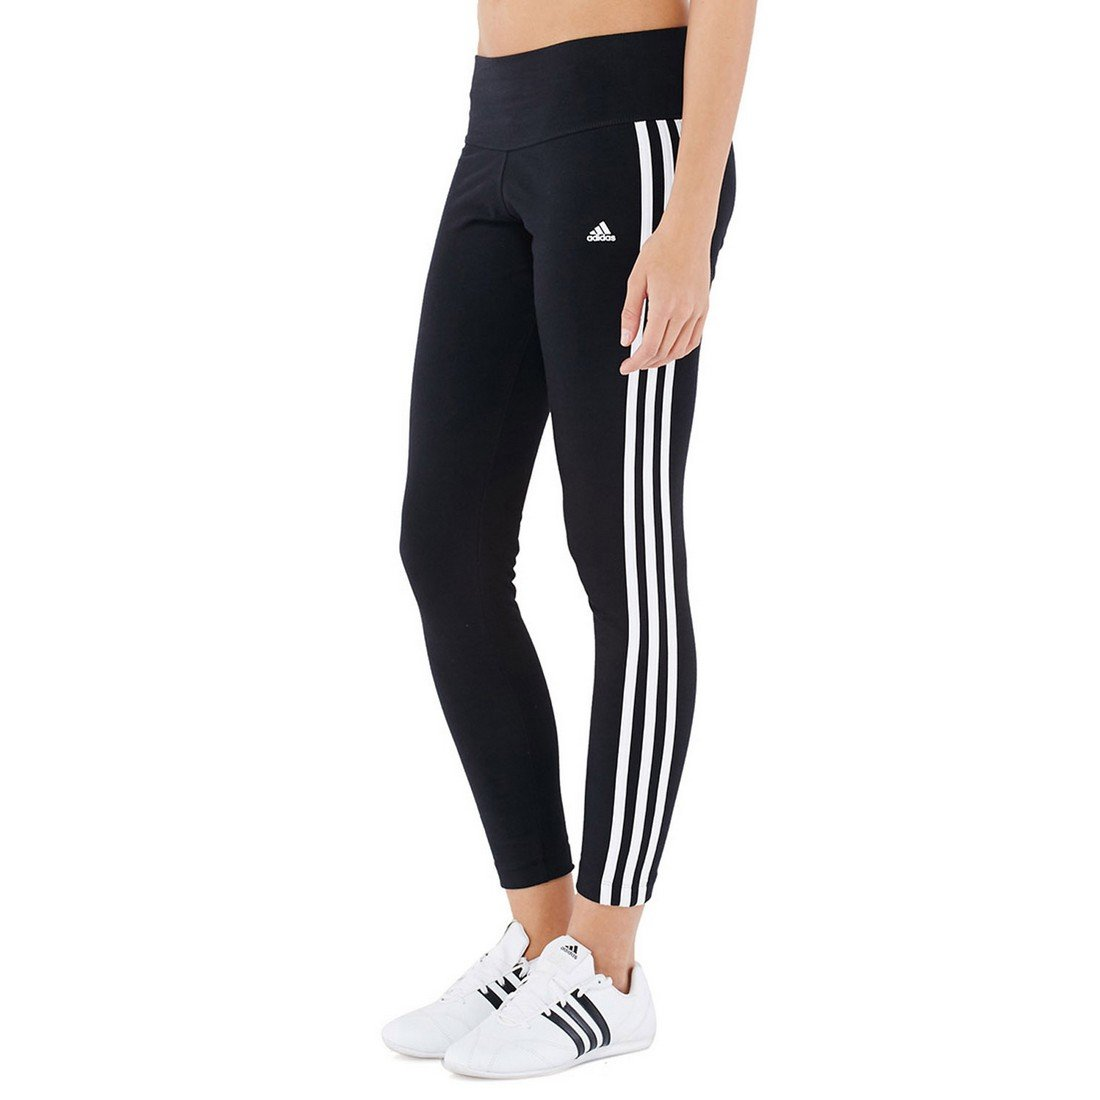 pantaloni adidas acetato donna